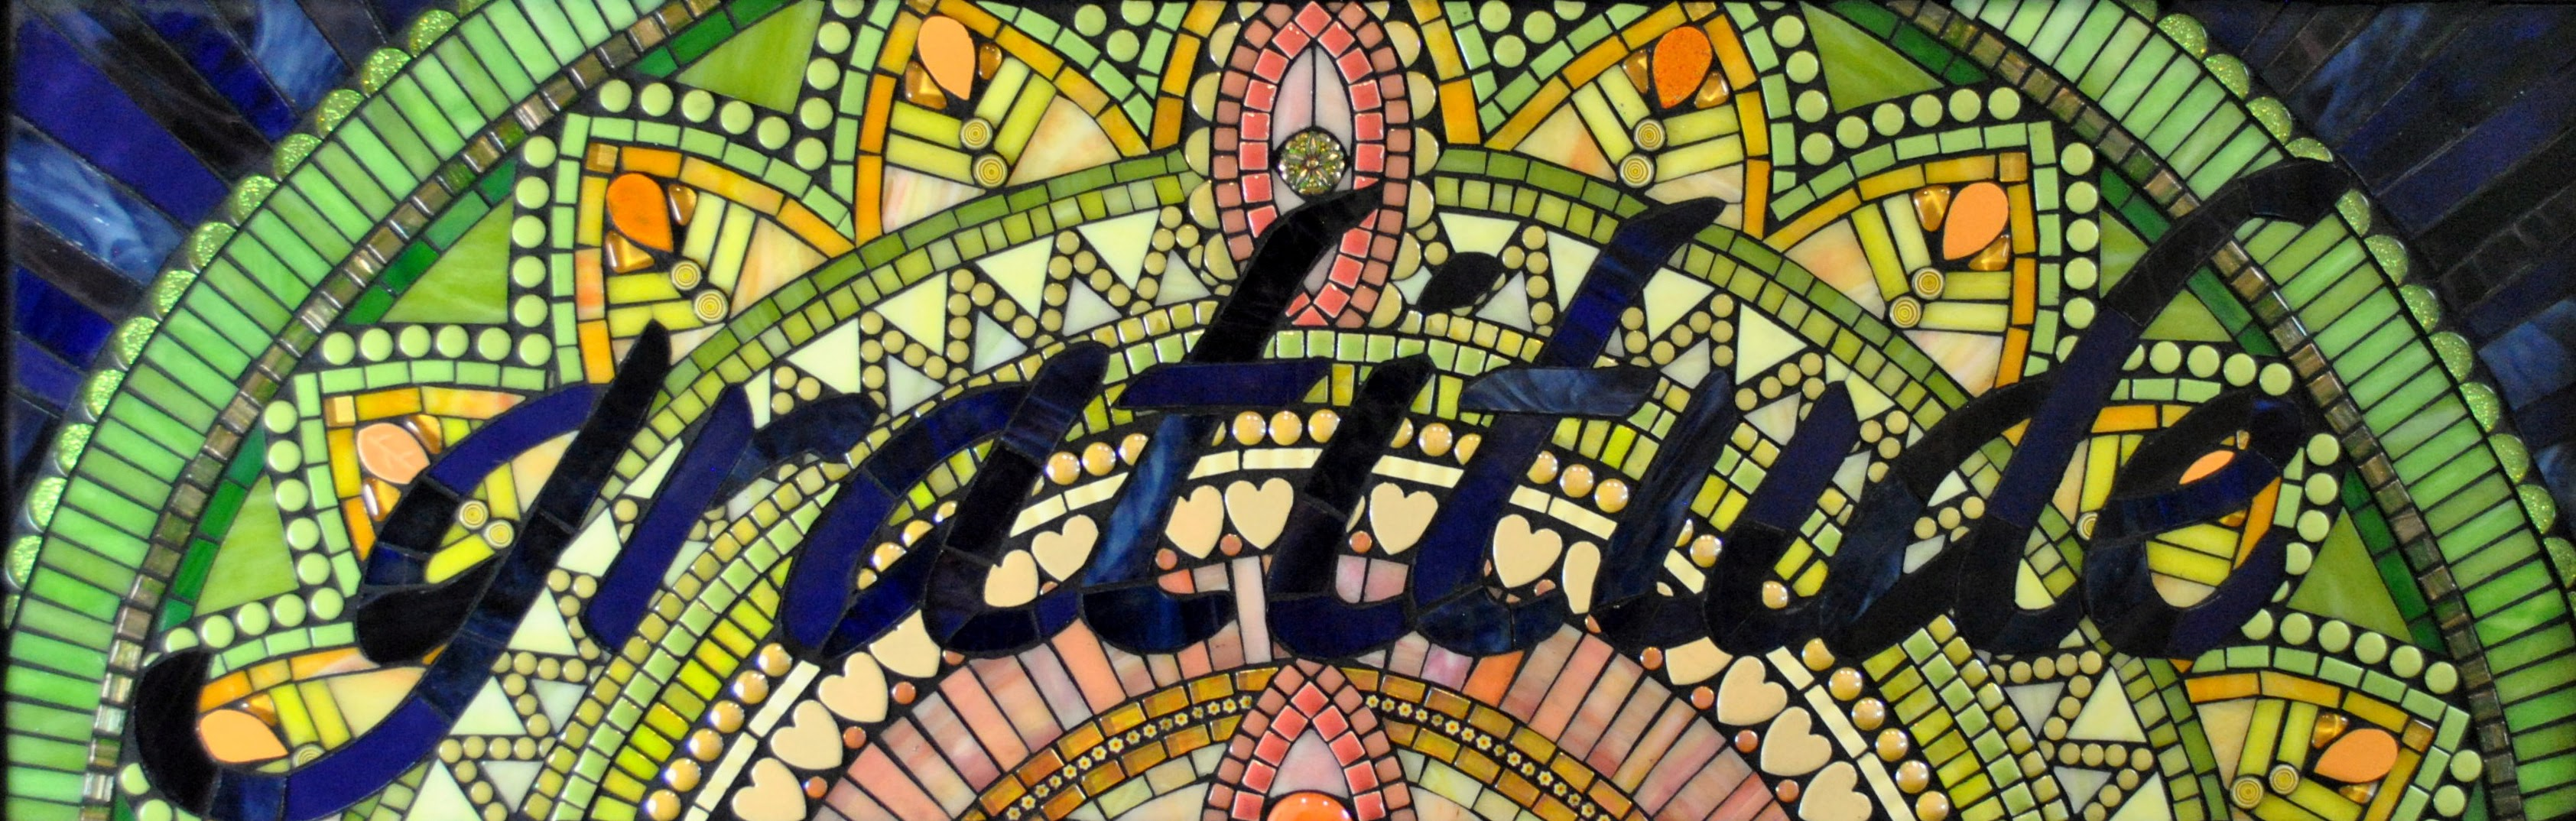 Gratitude Mandala by Brenda Pokorny